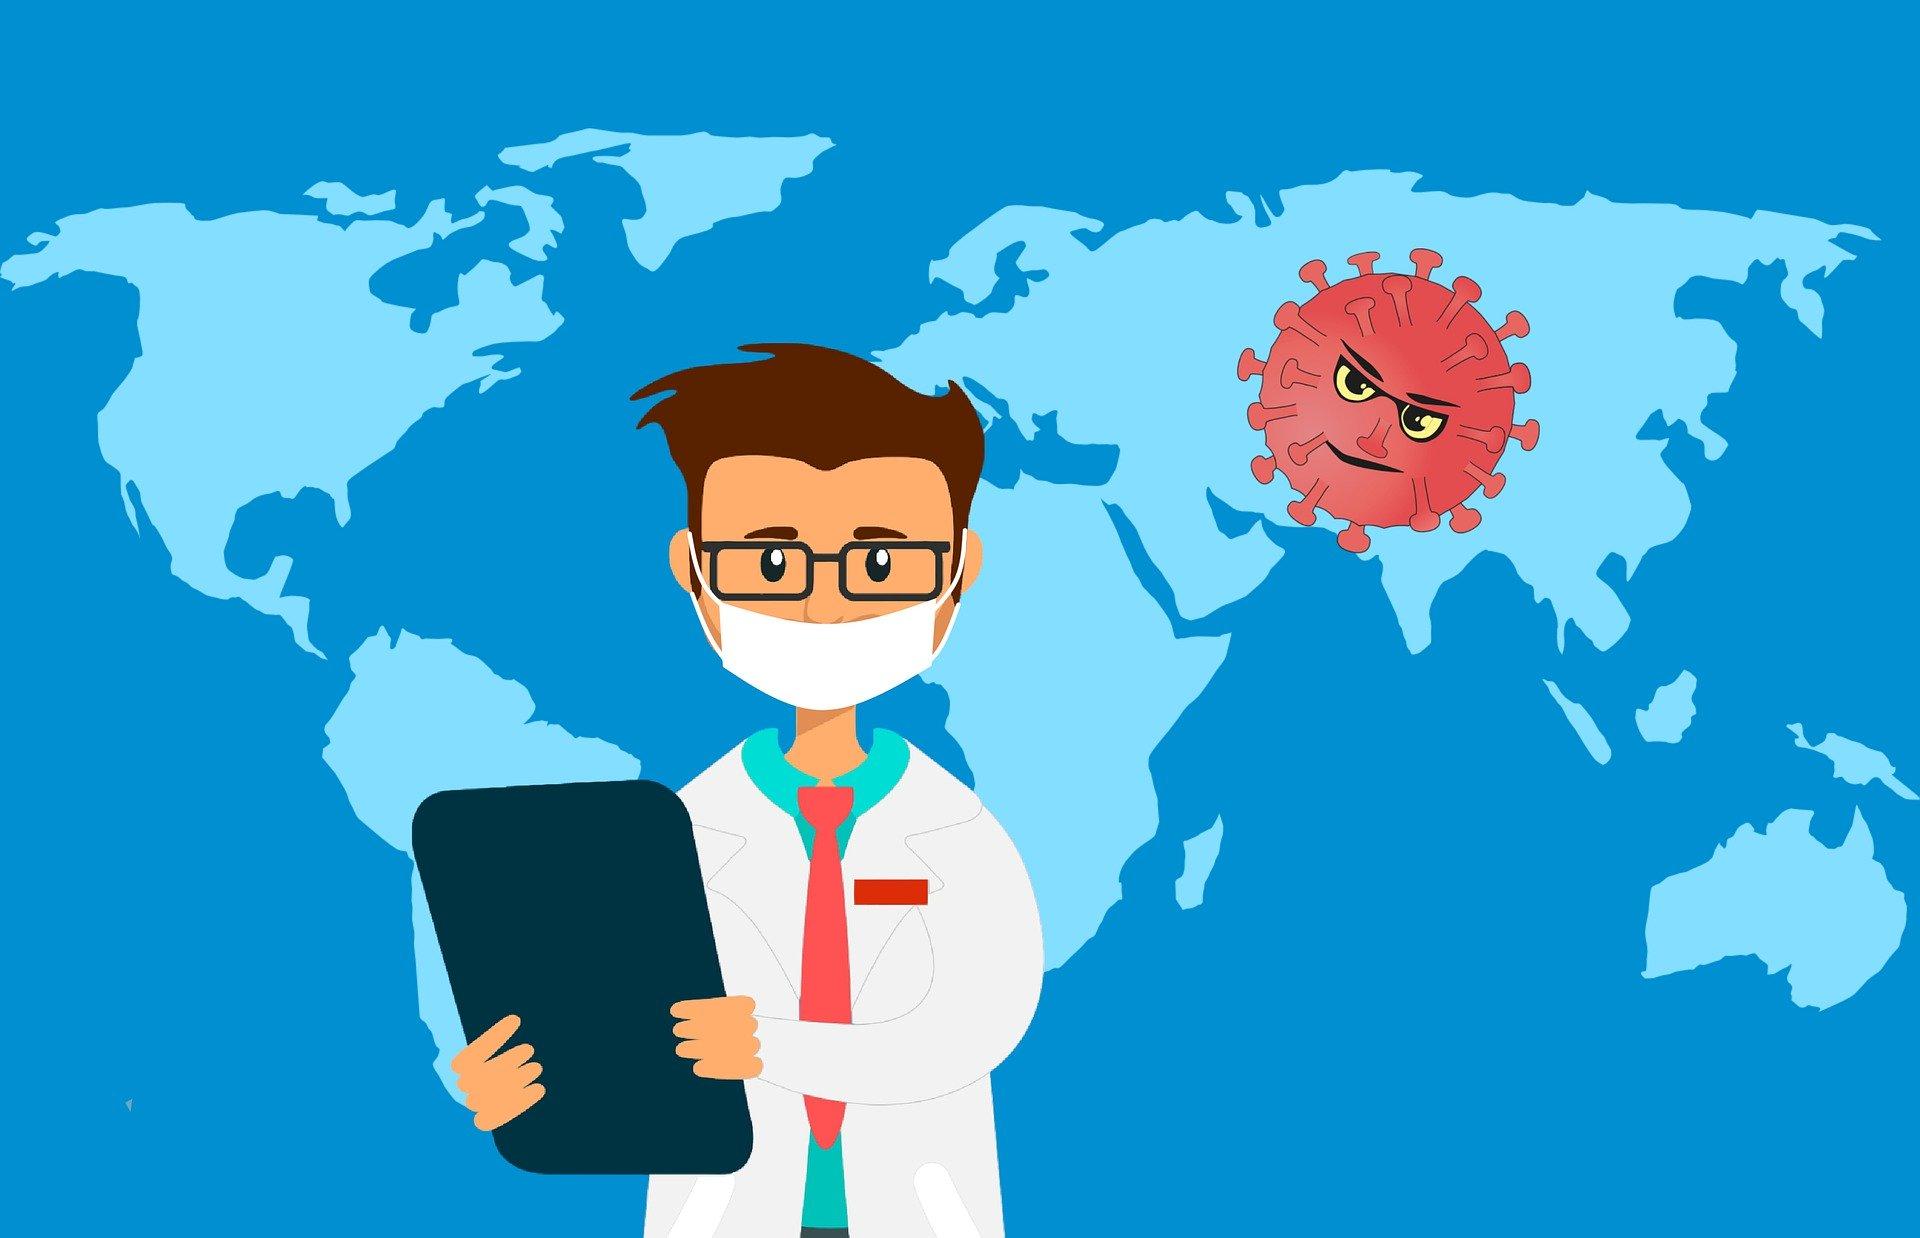 Endoscopia o Colonoscopia y Coronavirus